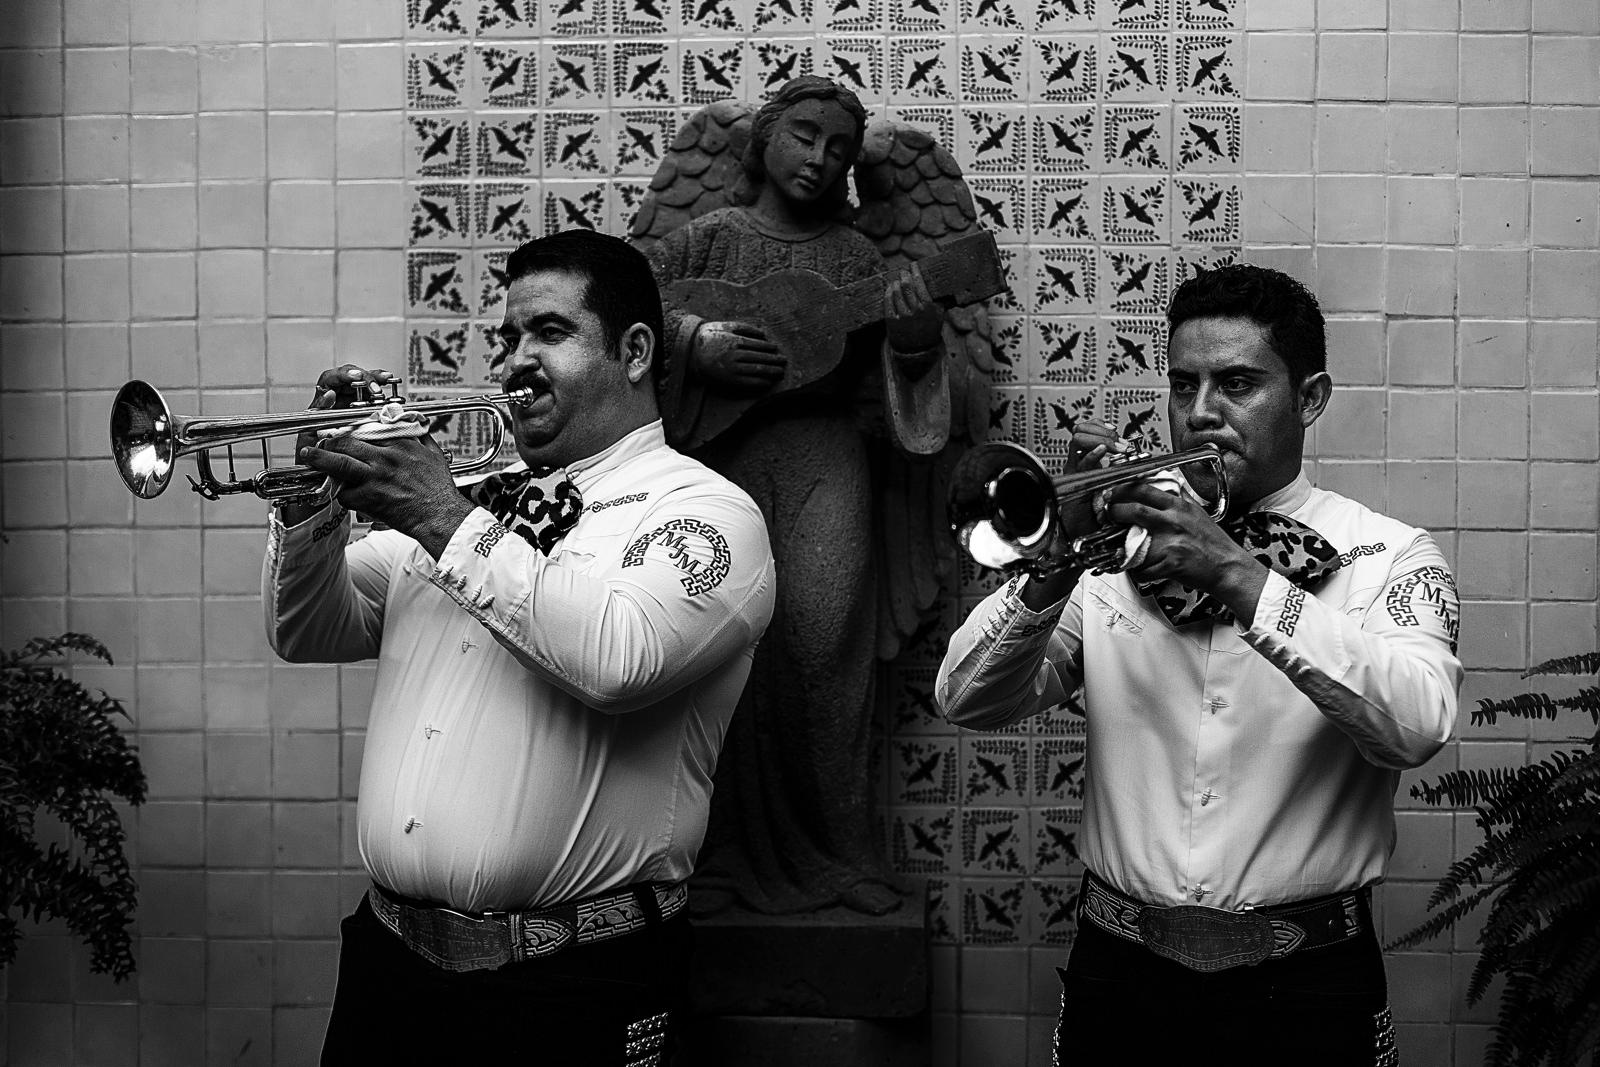 Mariachi trumpeters play at Hacienda San Angel